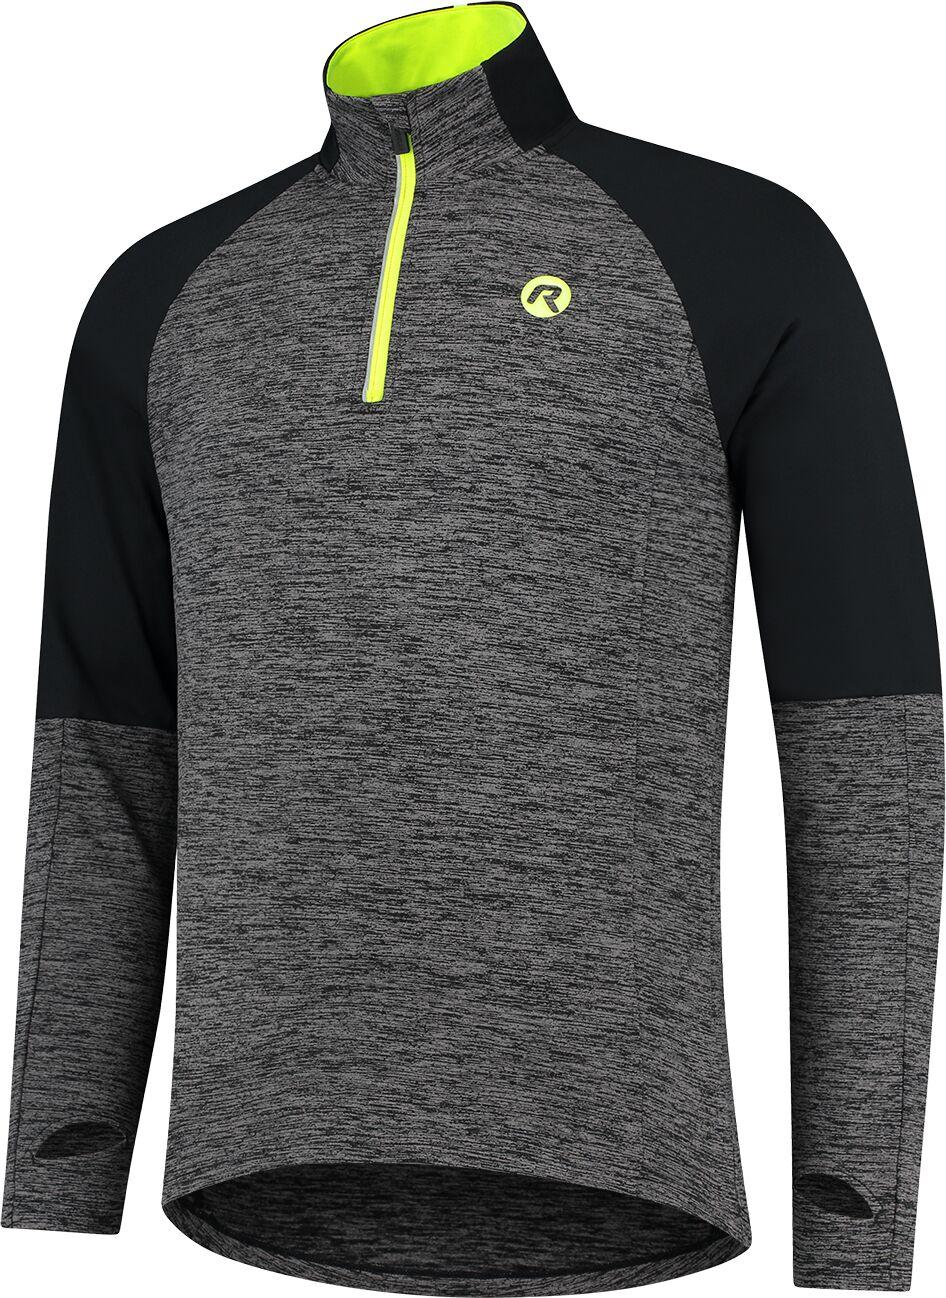 ROGELLI męska bluza do biegania ENJOY black/grey ROG351102 Rozmiar: 3XL,ROG351102.S